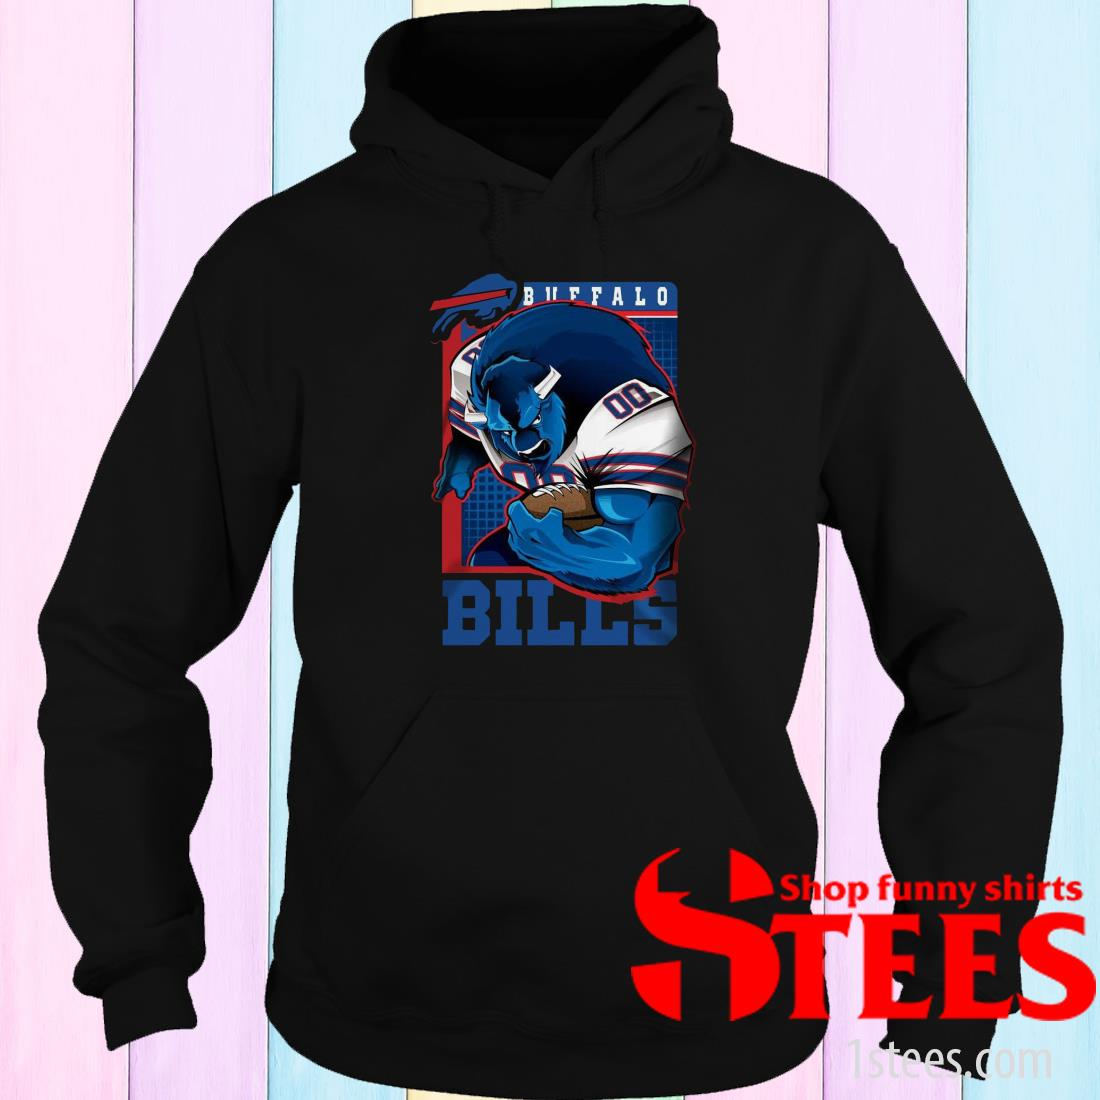 Official Buffalo Bill NFL Hoodie